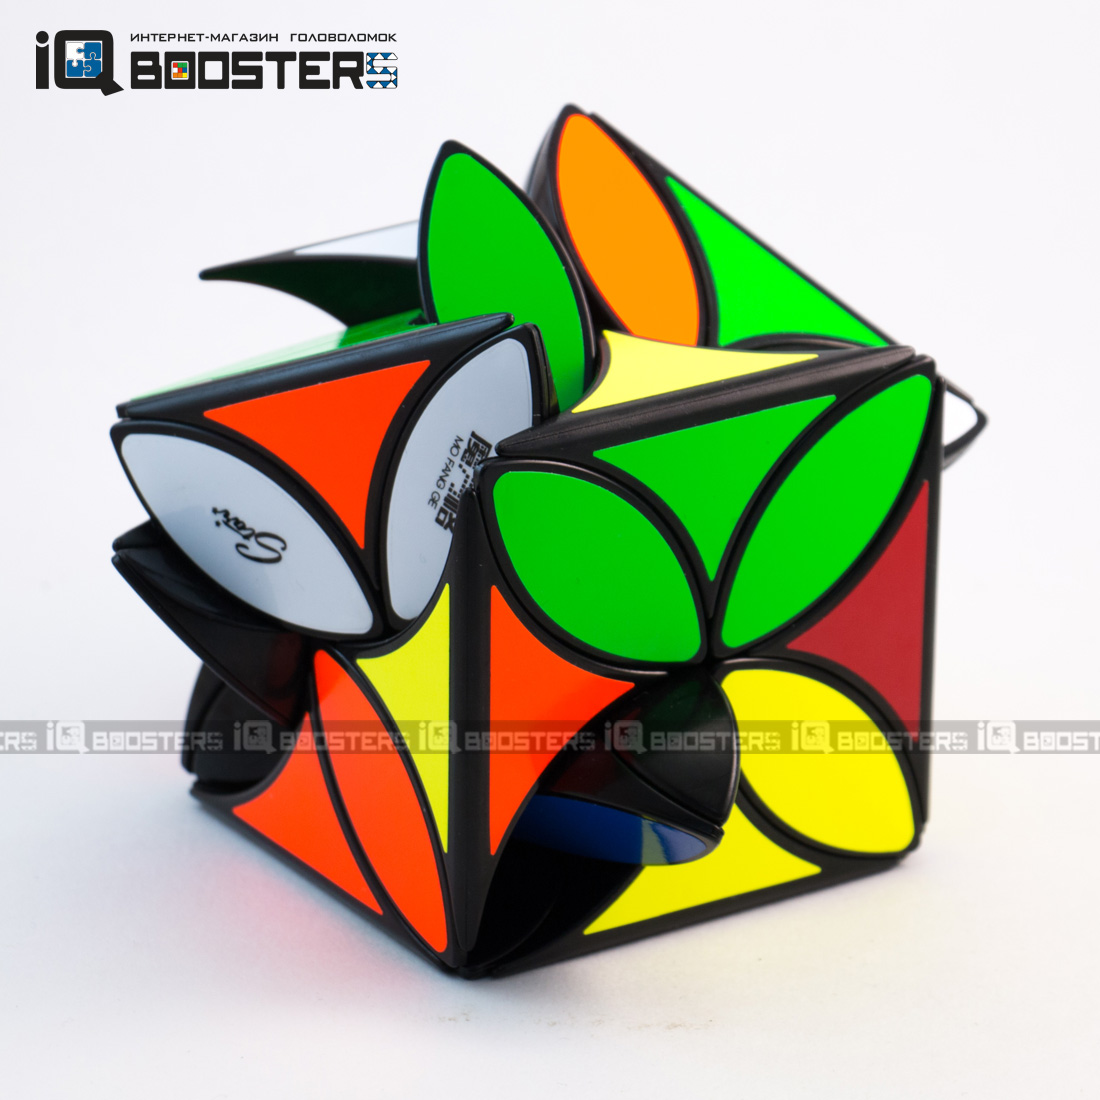 qiyi_clover_cube_b6